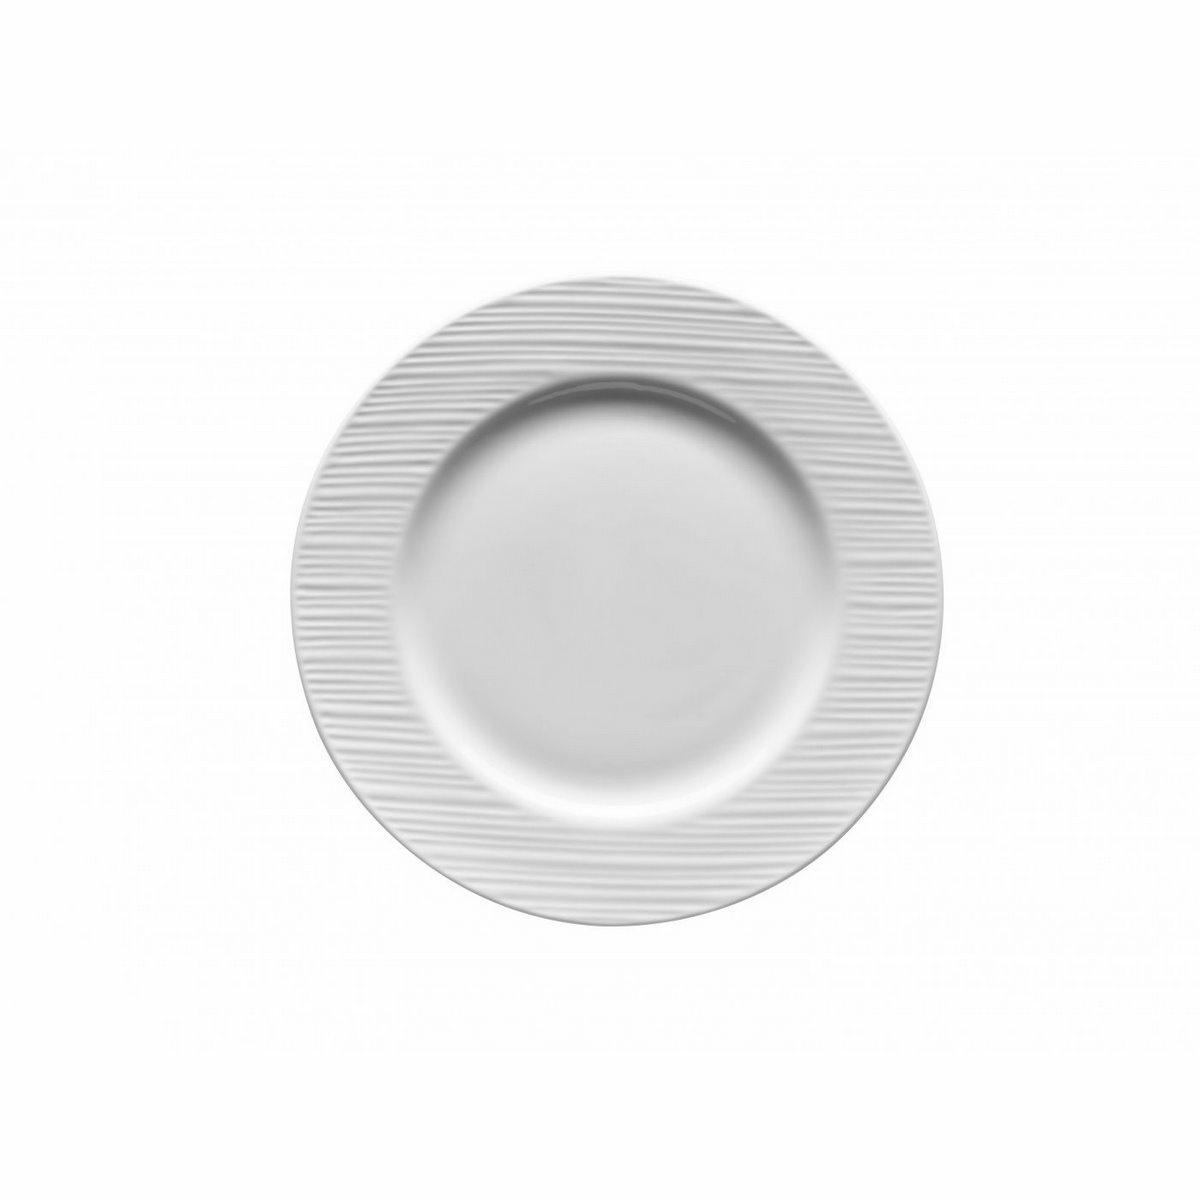 Mäser Sada dezertních talířů Angelina 20 cm, 6 ks